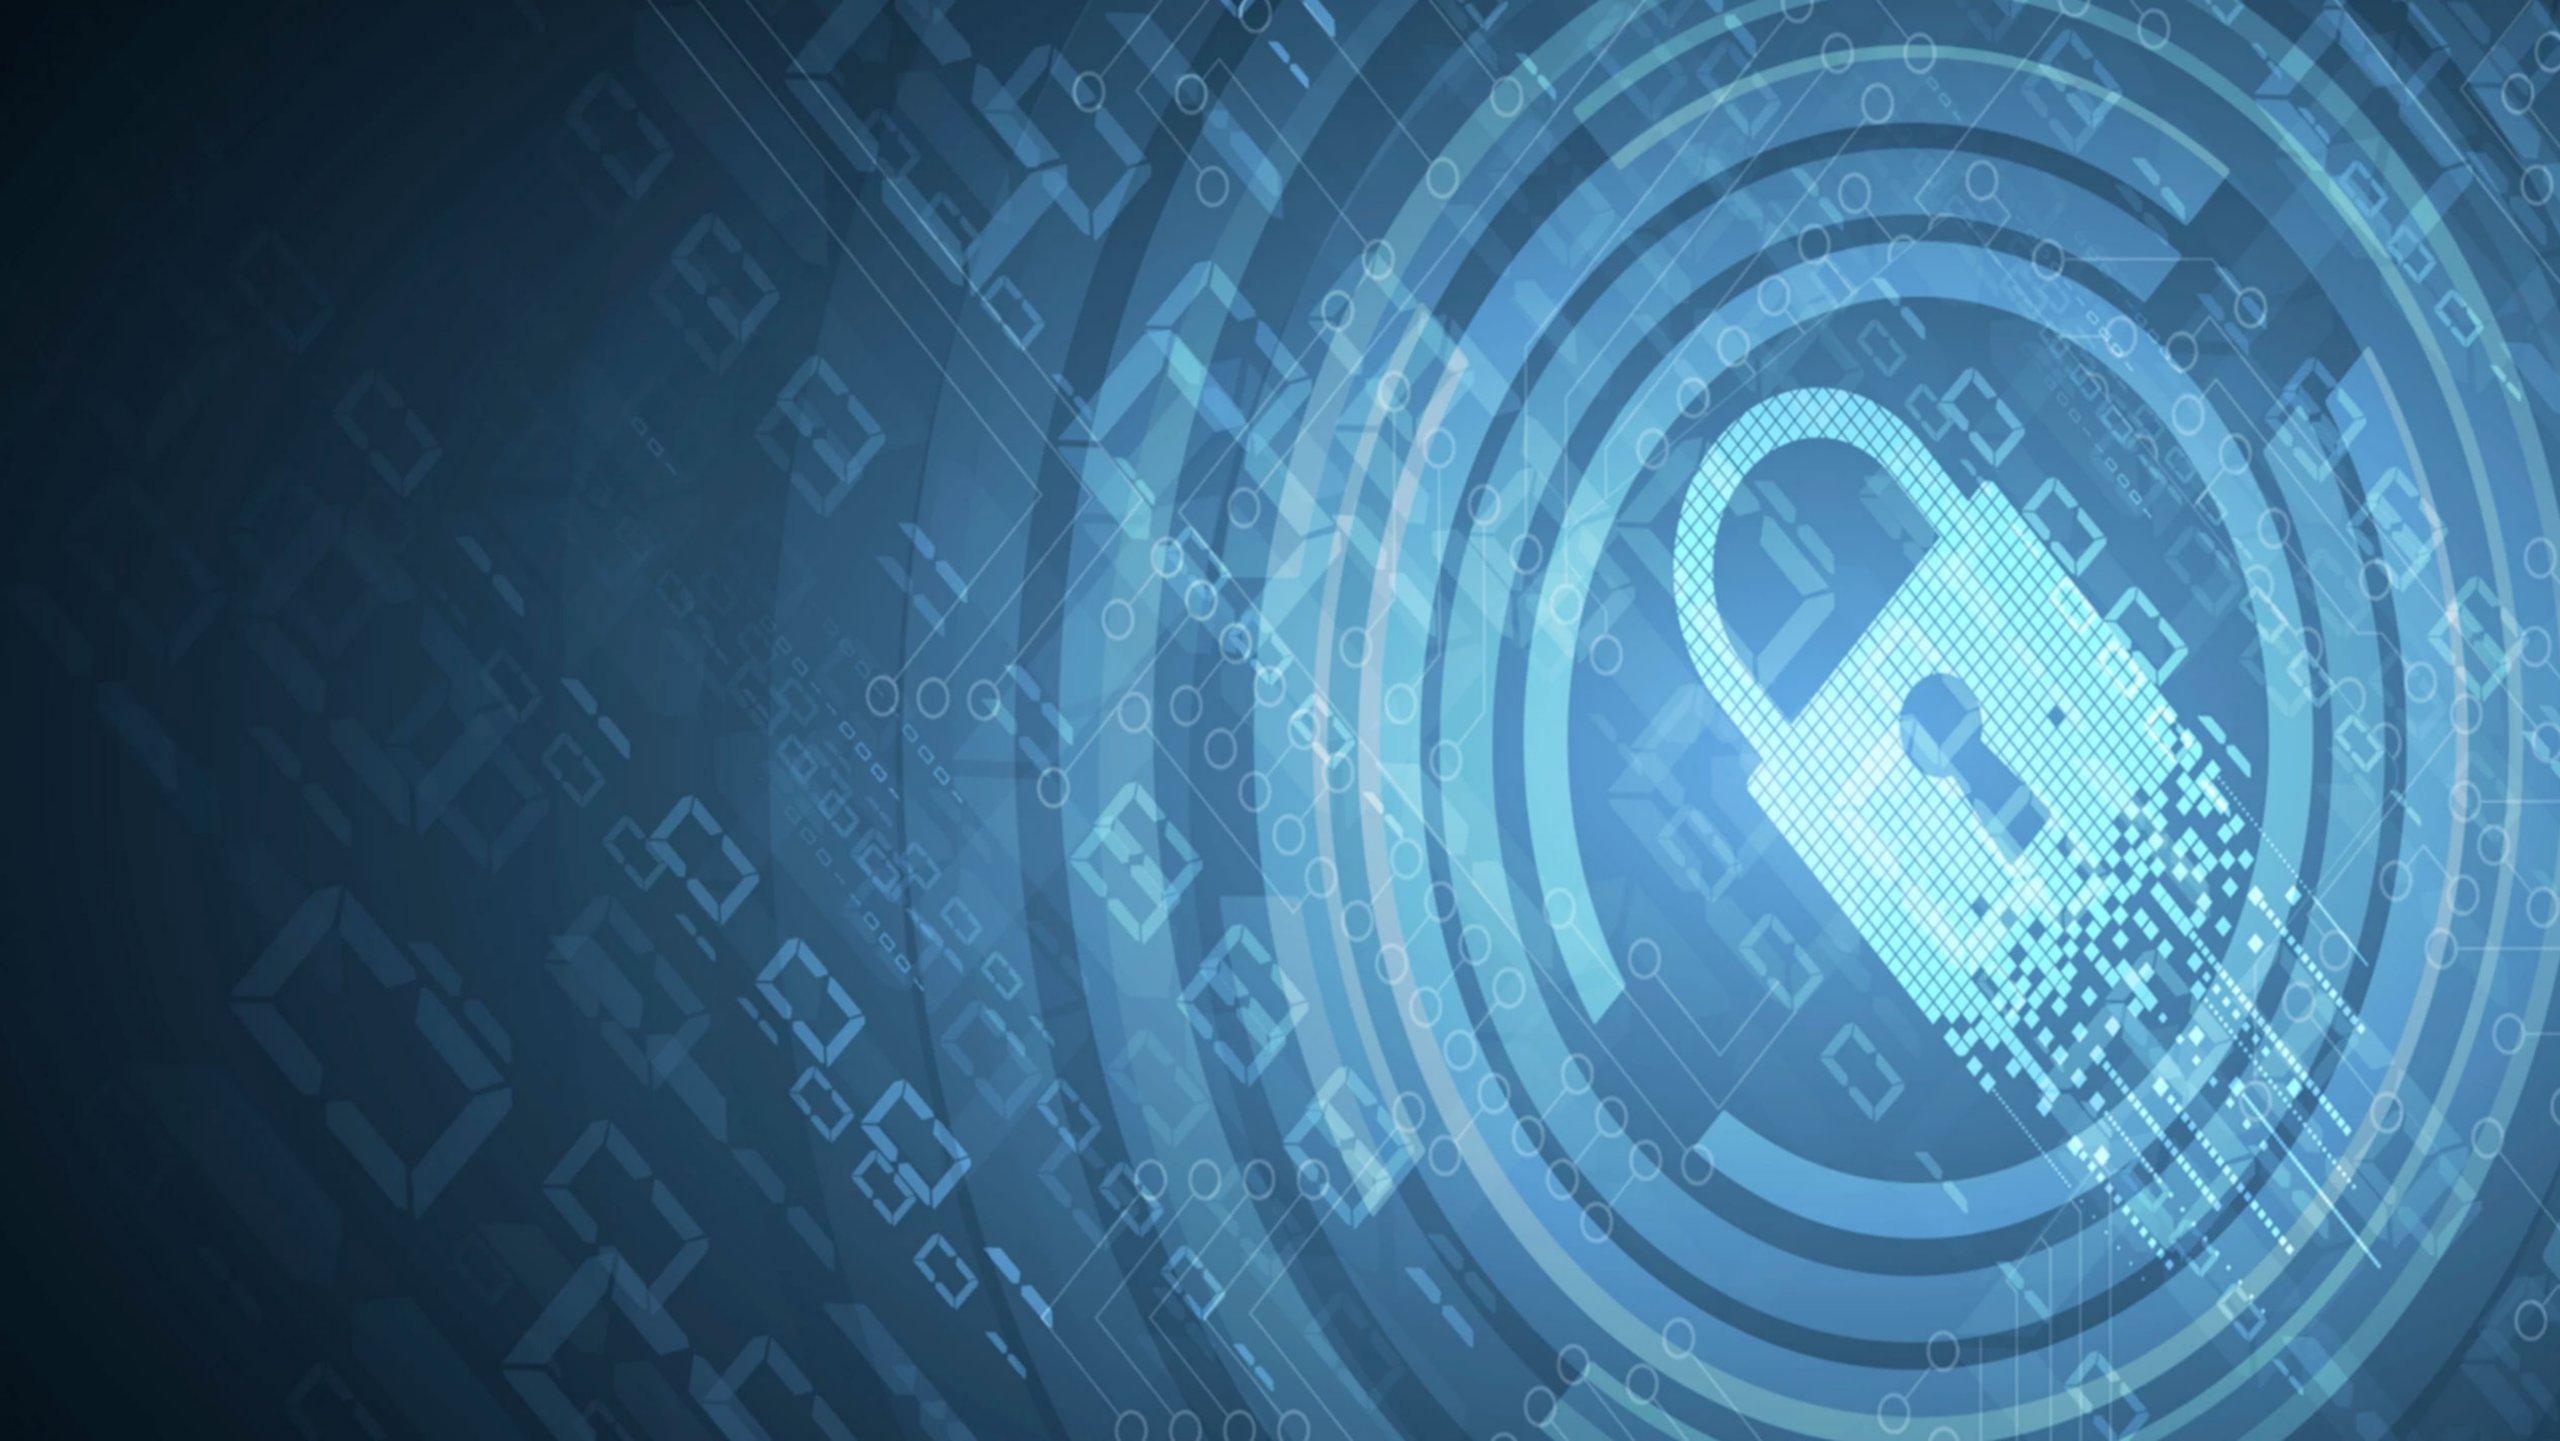 Enabling Secure IT/OT Integration Through IDMZ